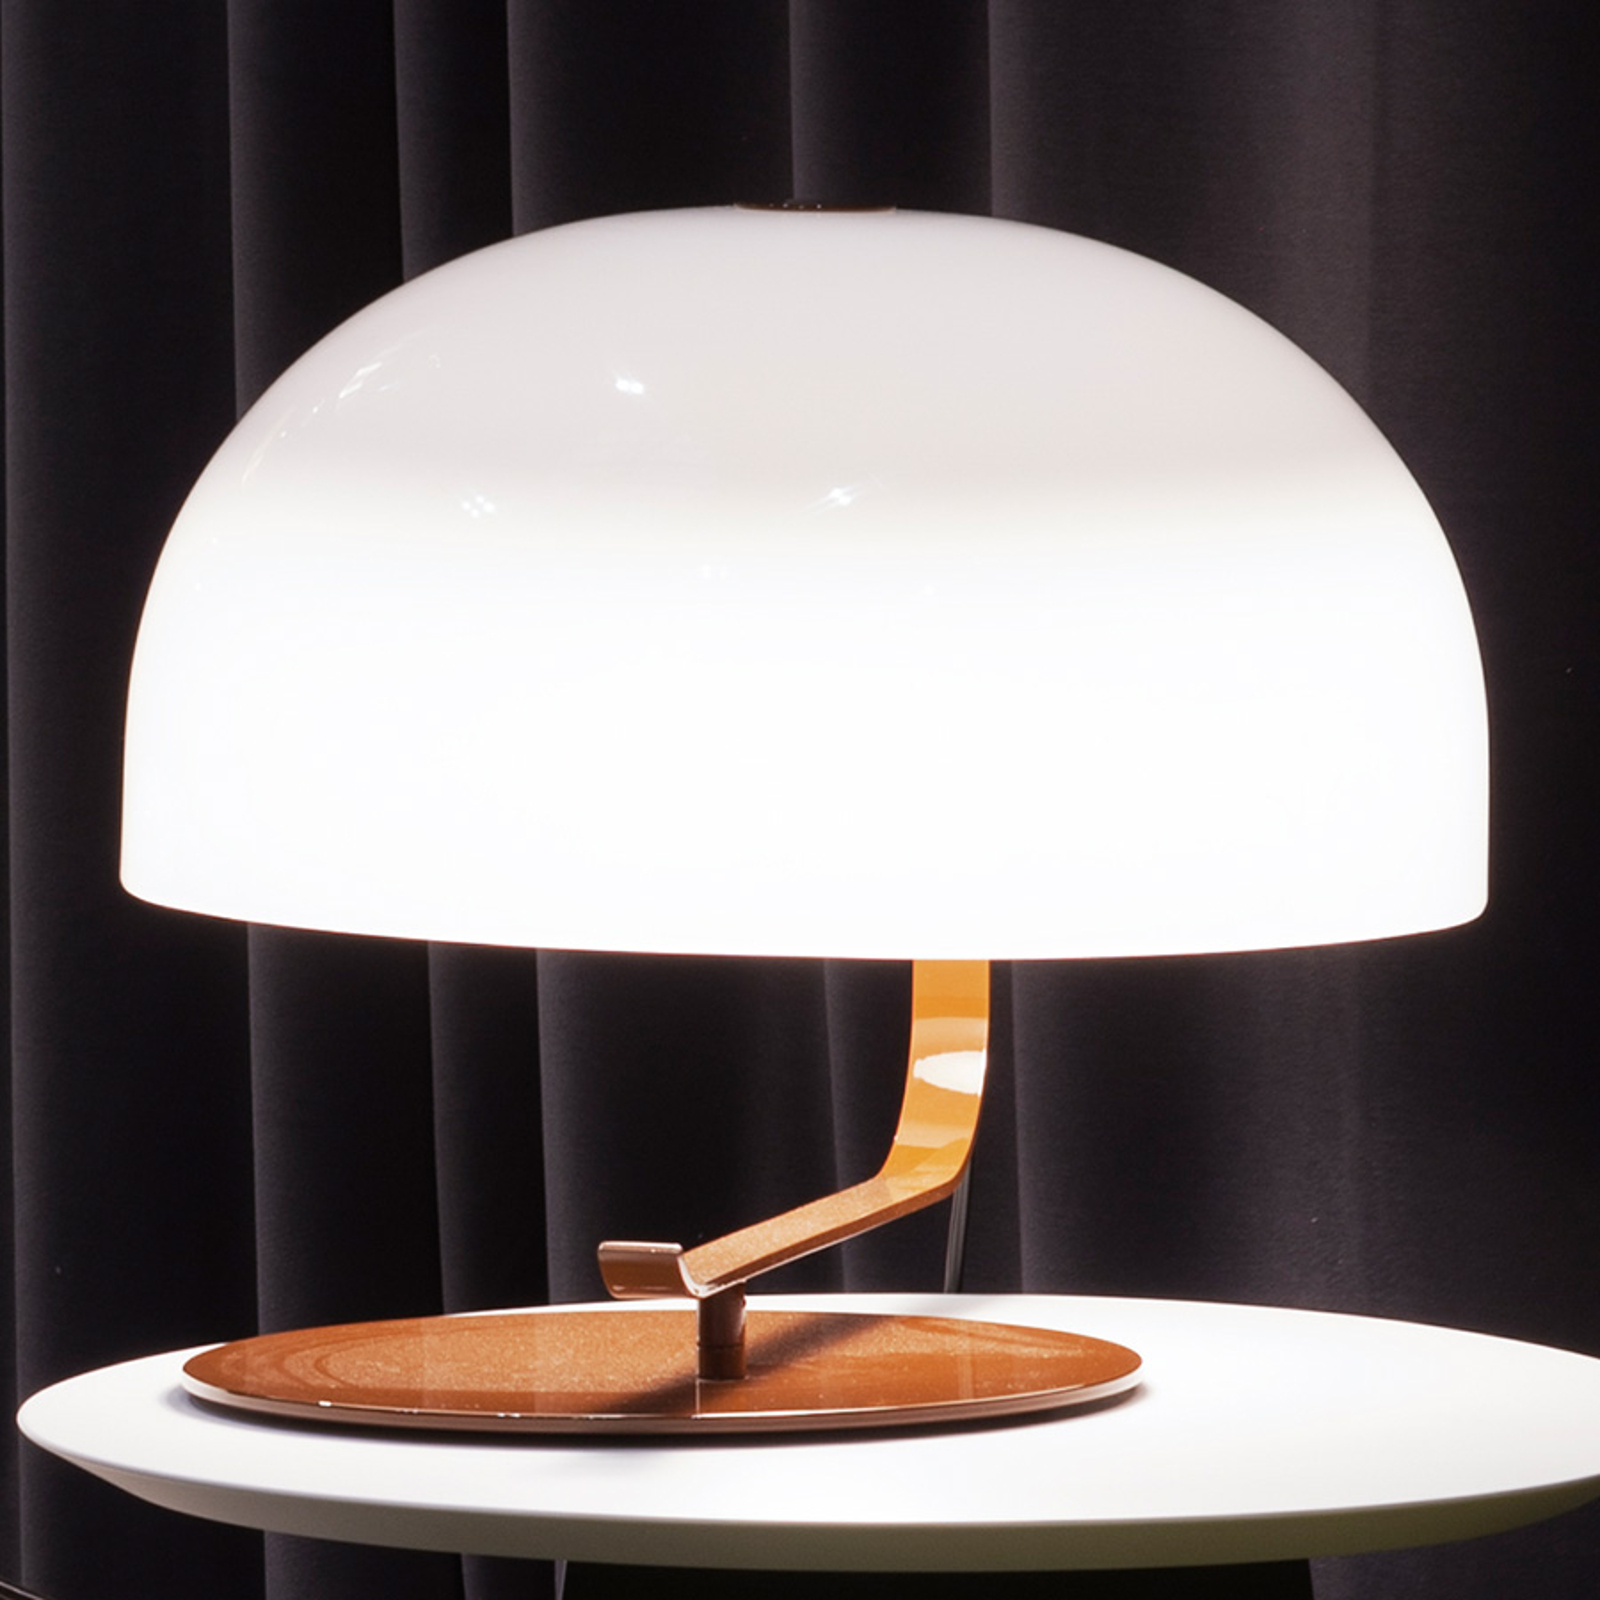 Lampada di design retrò Zanuso c. base marrone